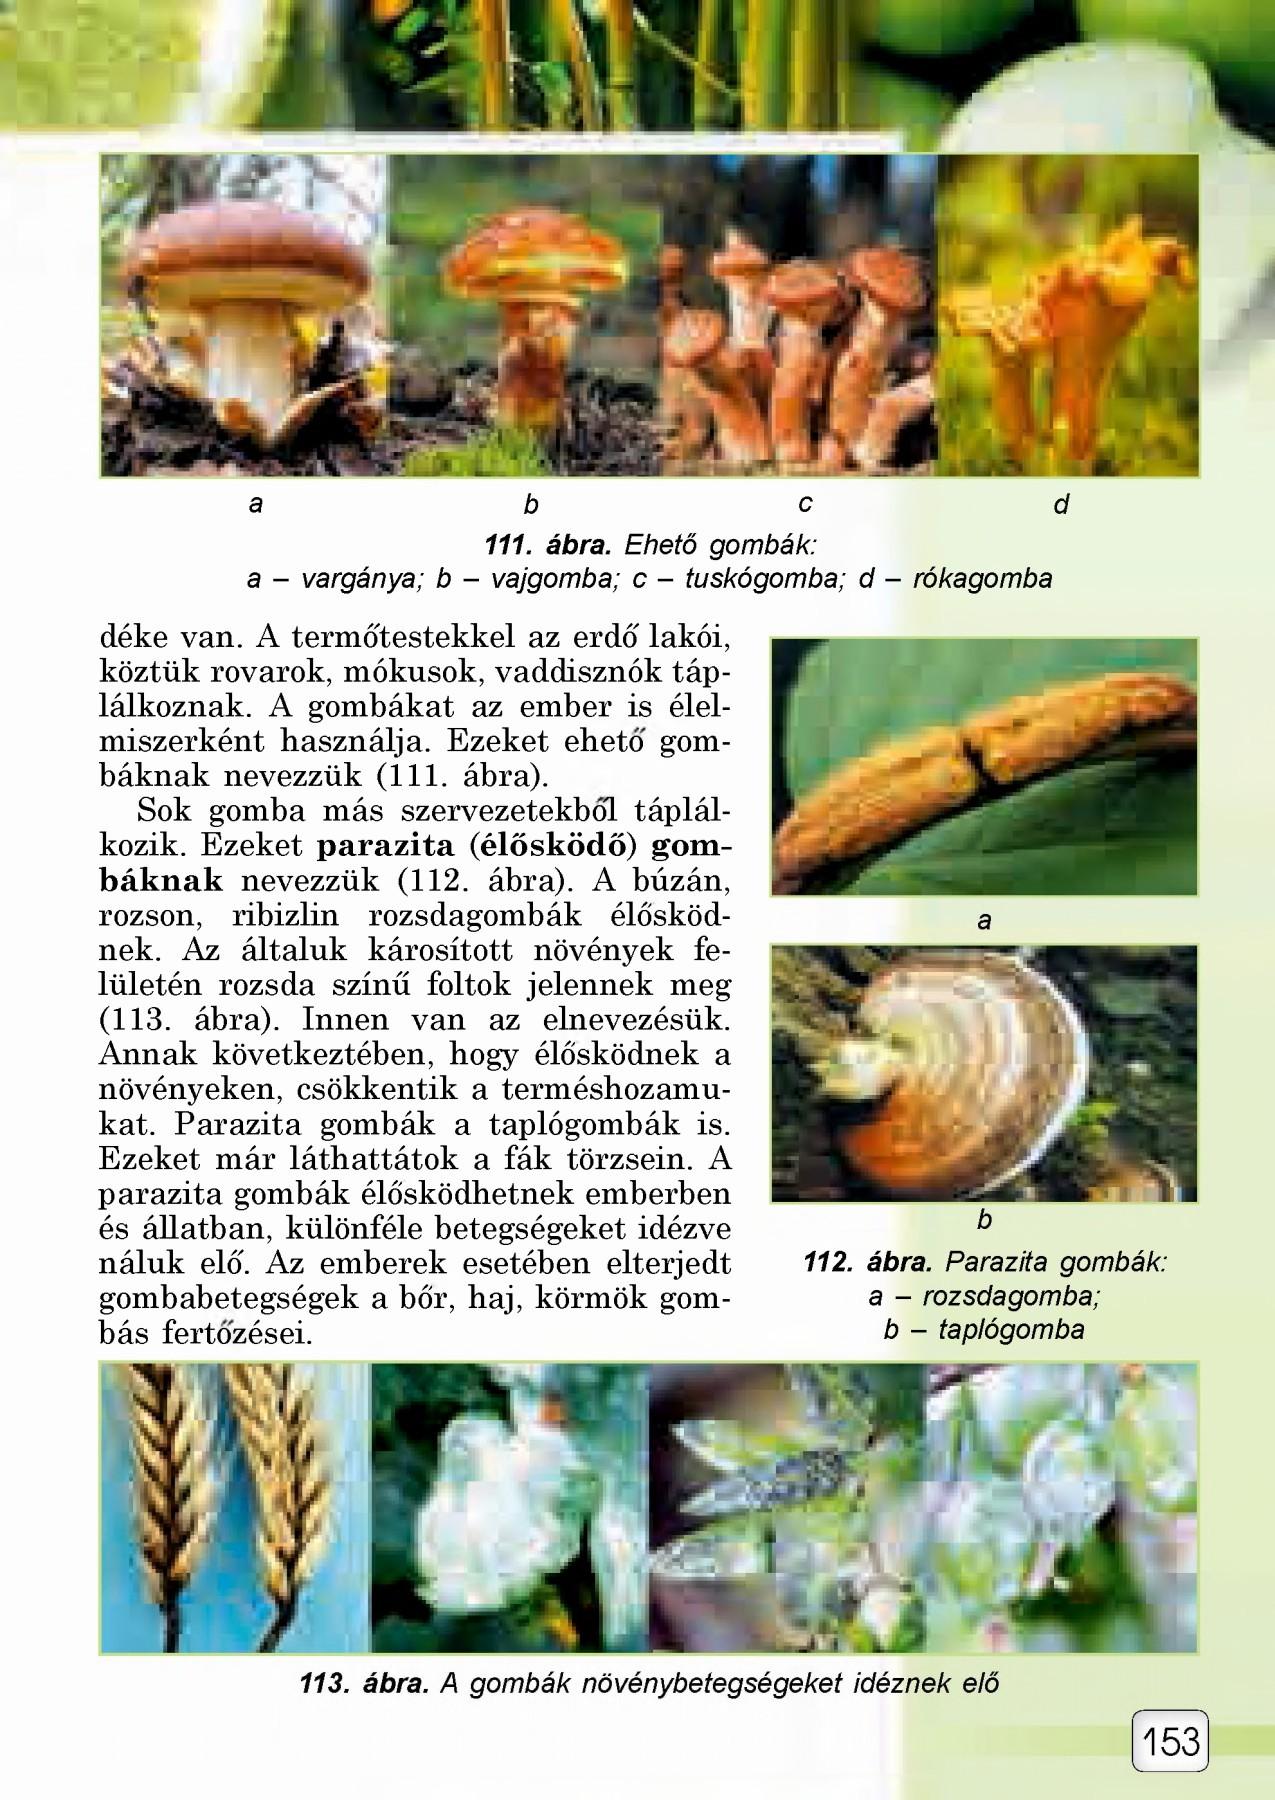 Gyurusfergek puhatestuek, Puhatestűek – Wikipédia